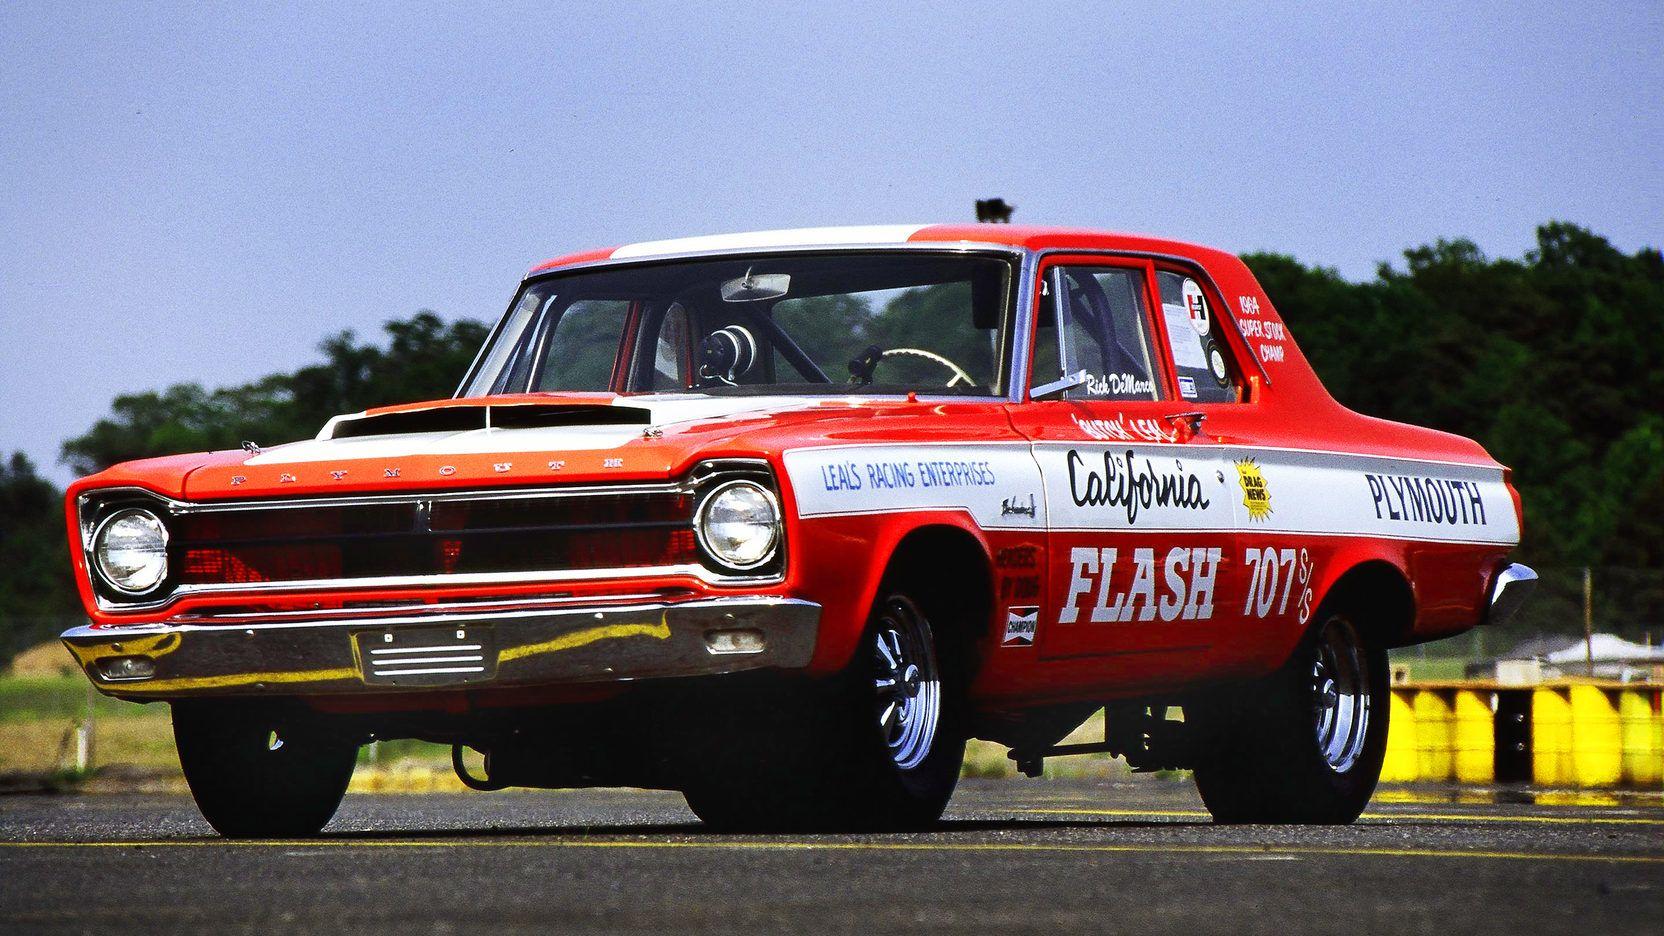 Super Stock Drag Cars Pics Photos 1965 Plymouth Belvedere I A990 Super Stock 426 Hemi Drag Cars Plymouth Belvedere Plymouth